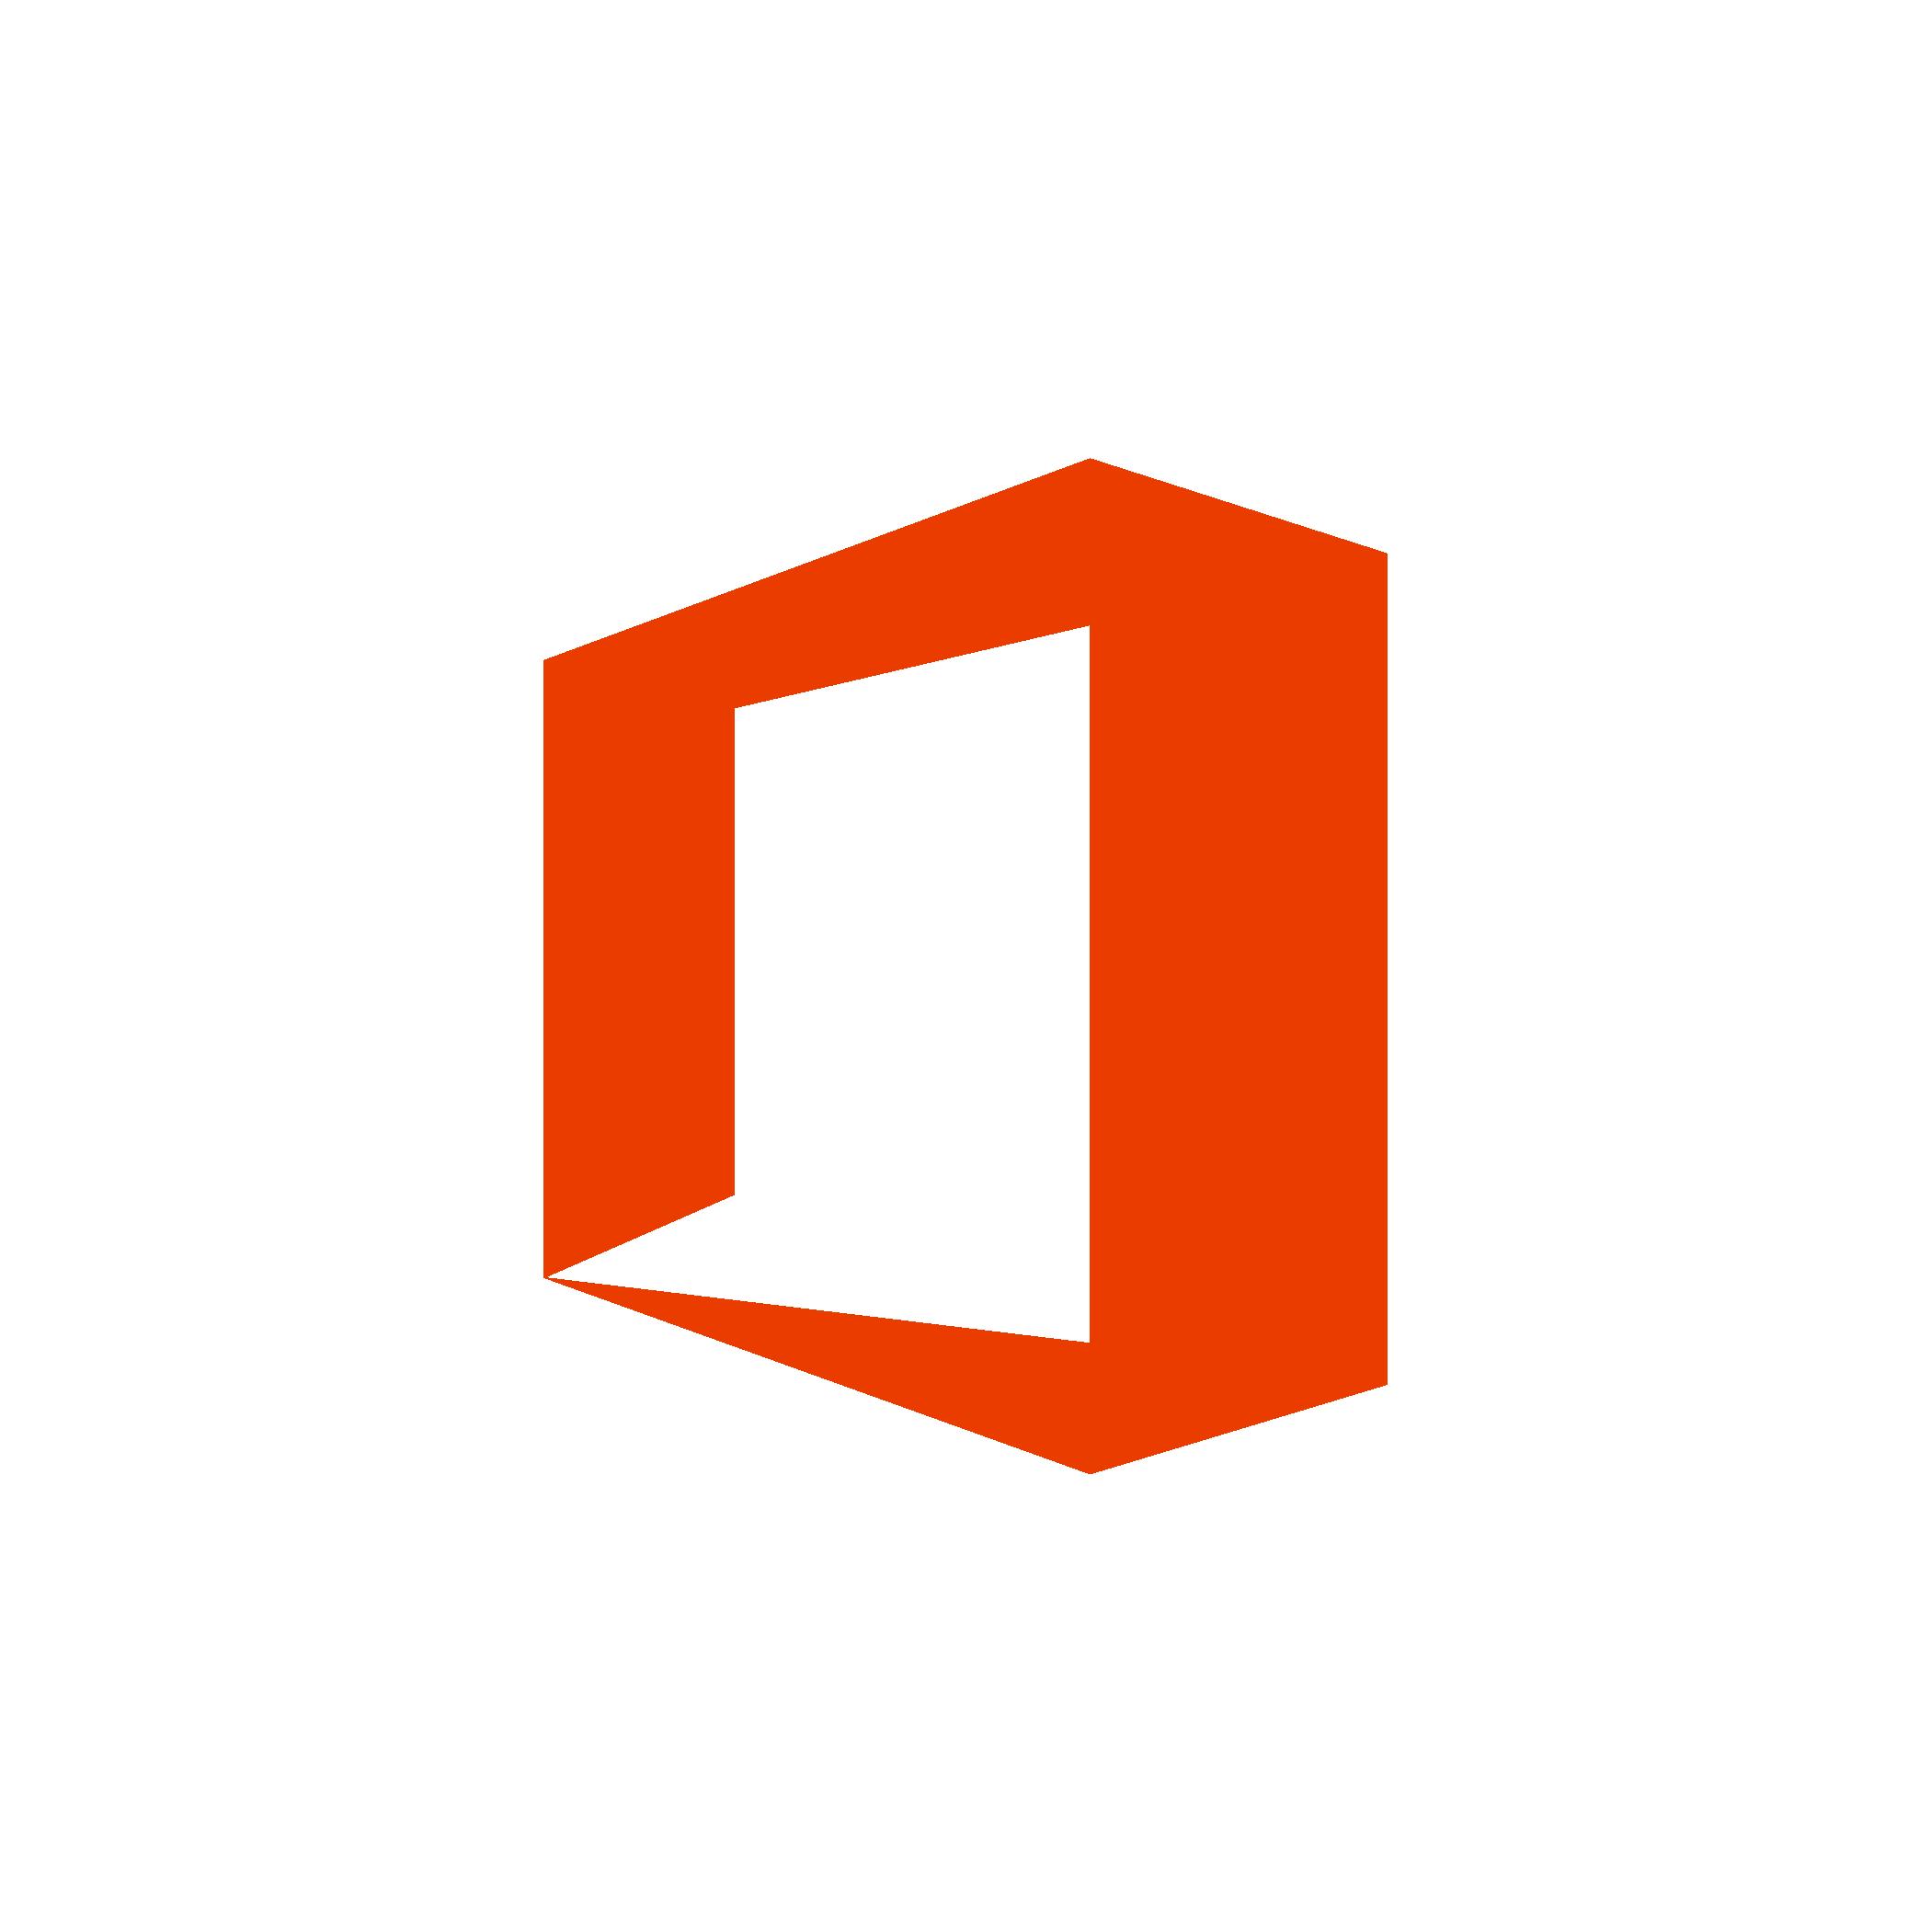 Microsoft Office 365 Integration | Stormboard